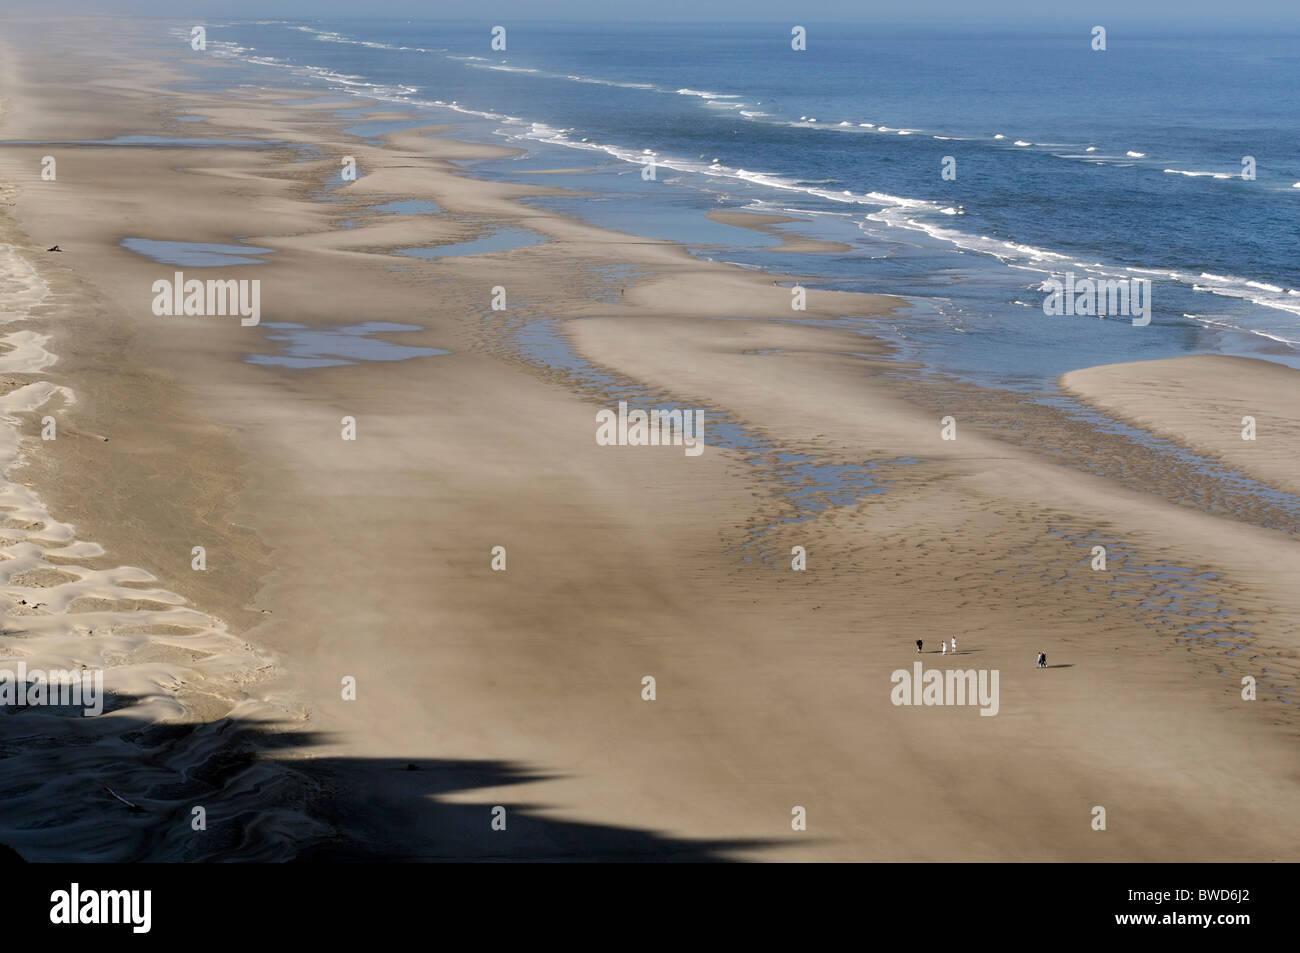 Baker Beach Florenz Oregon Usa Pazifik nordwestlich lange Sandstrand unberührte Küste Küste Küste Stockbild